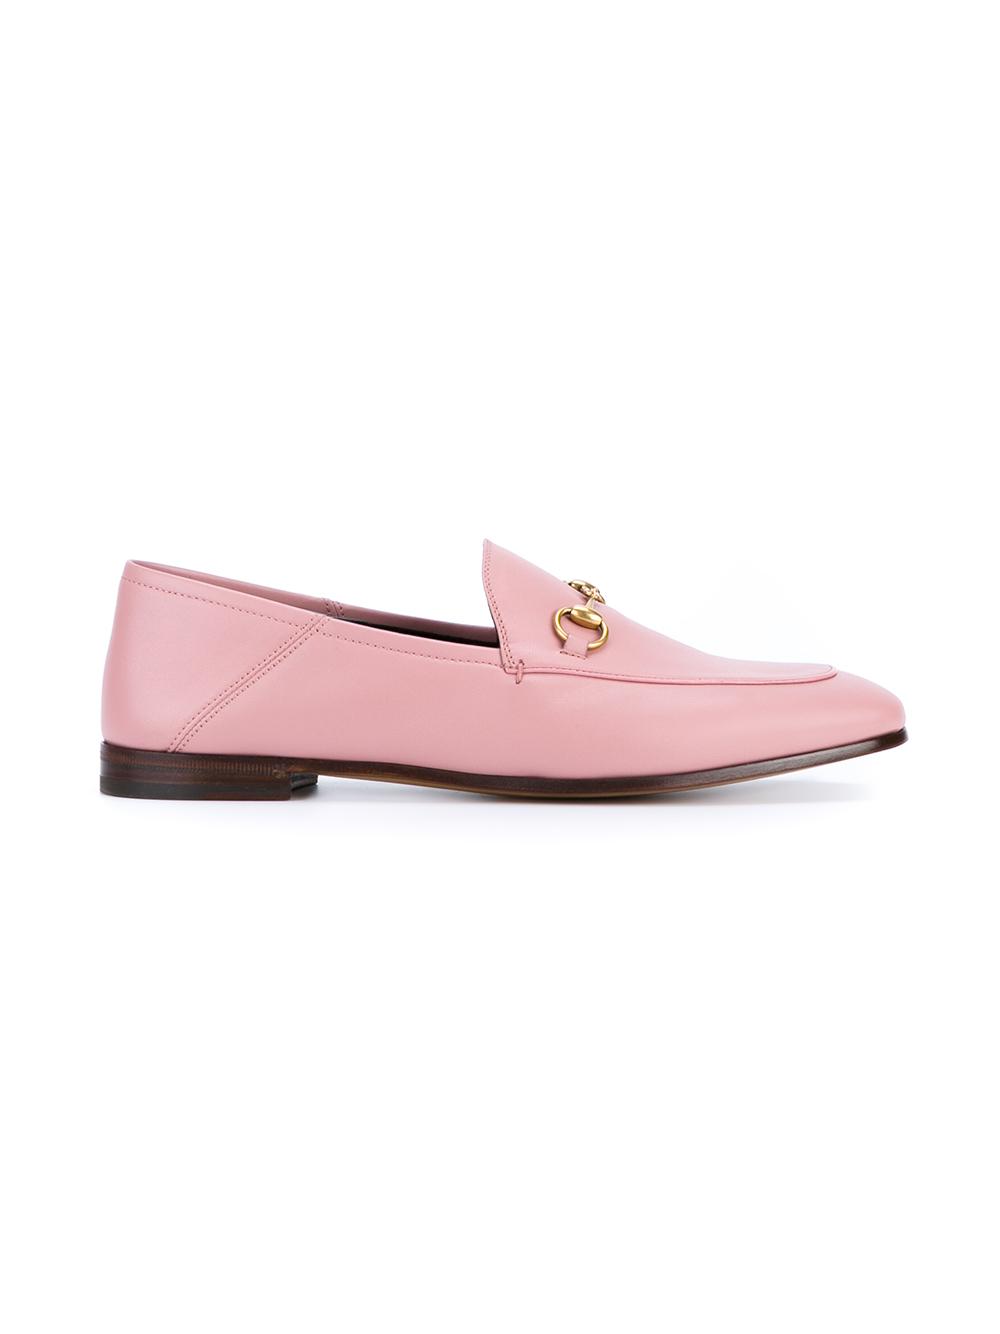 Lyst - Gucci Jordaan Horsebit Loafers in Pink